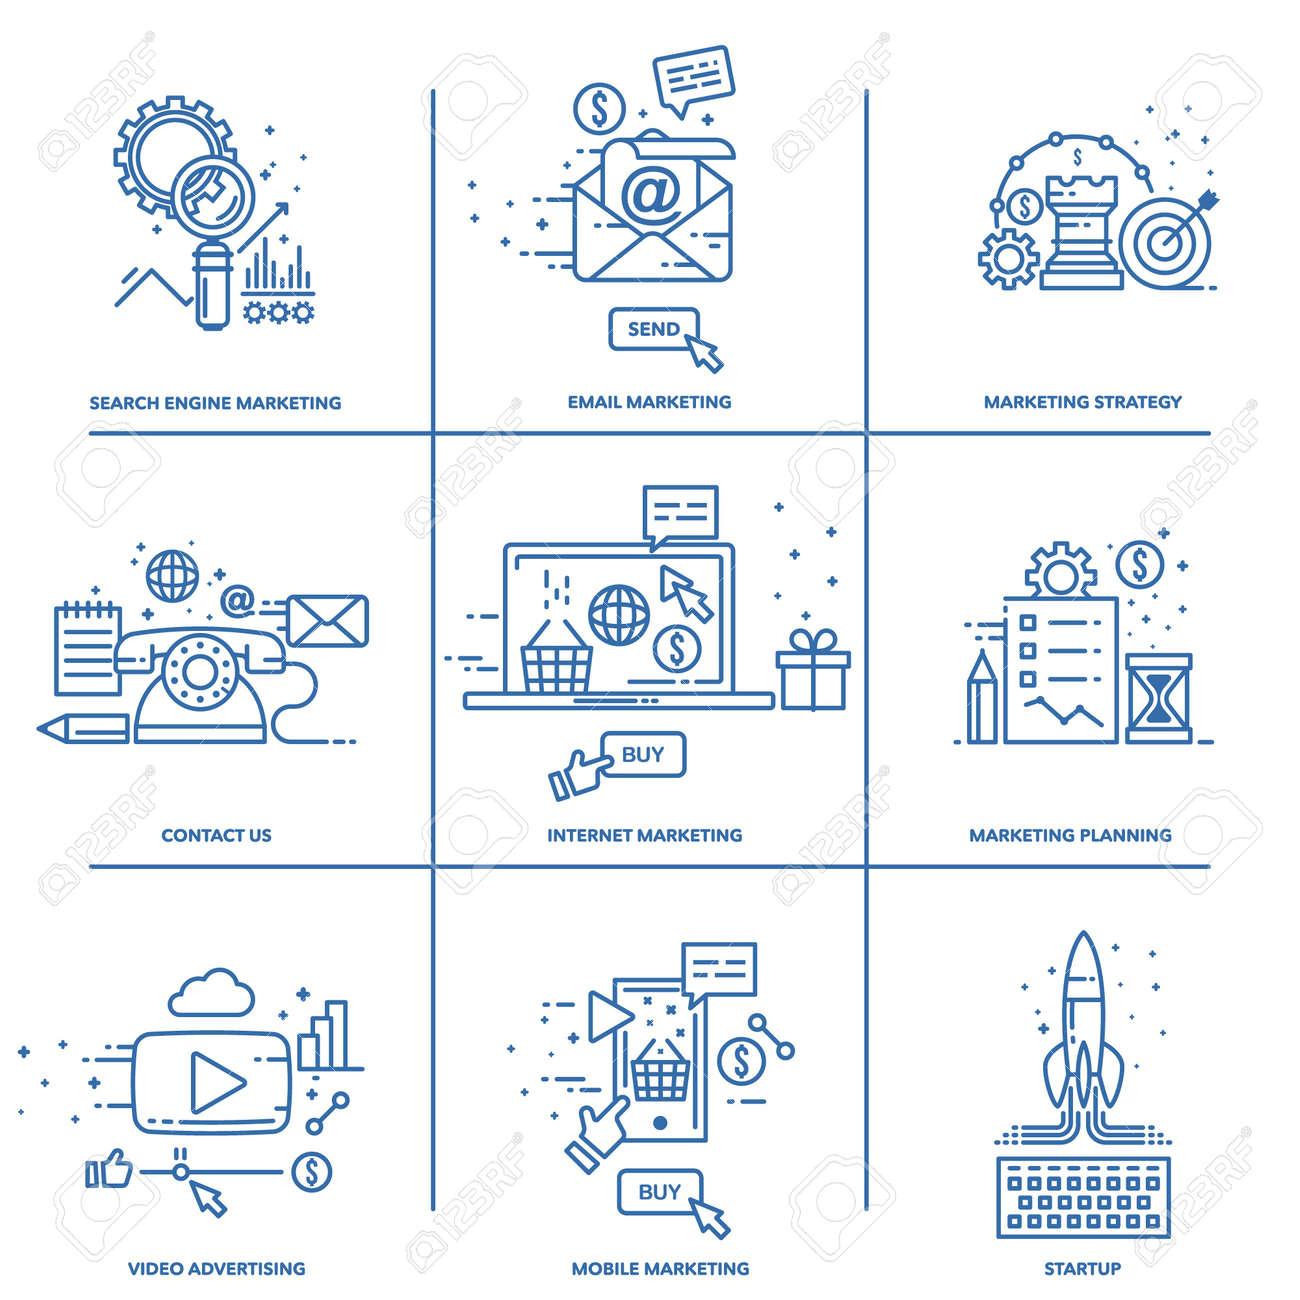 a set of elements for website design digital marketing vector royalty free cliparts vectors and stock illustration image 95735832 123rf com